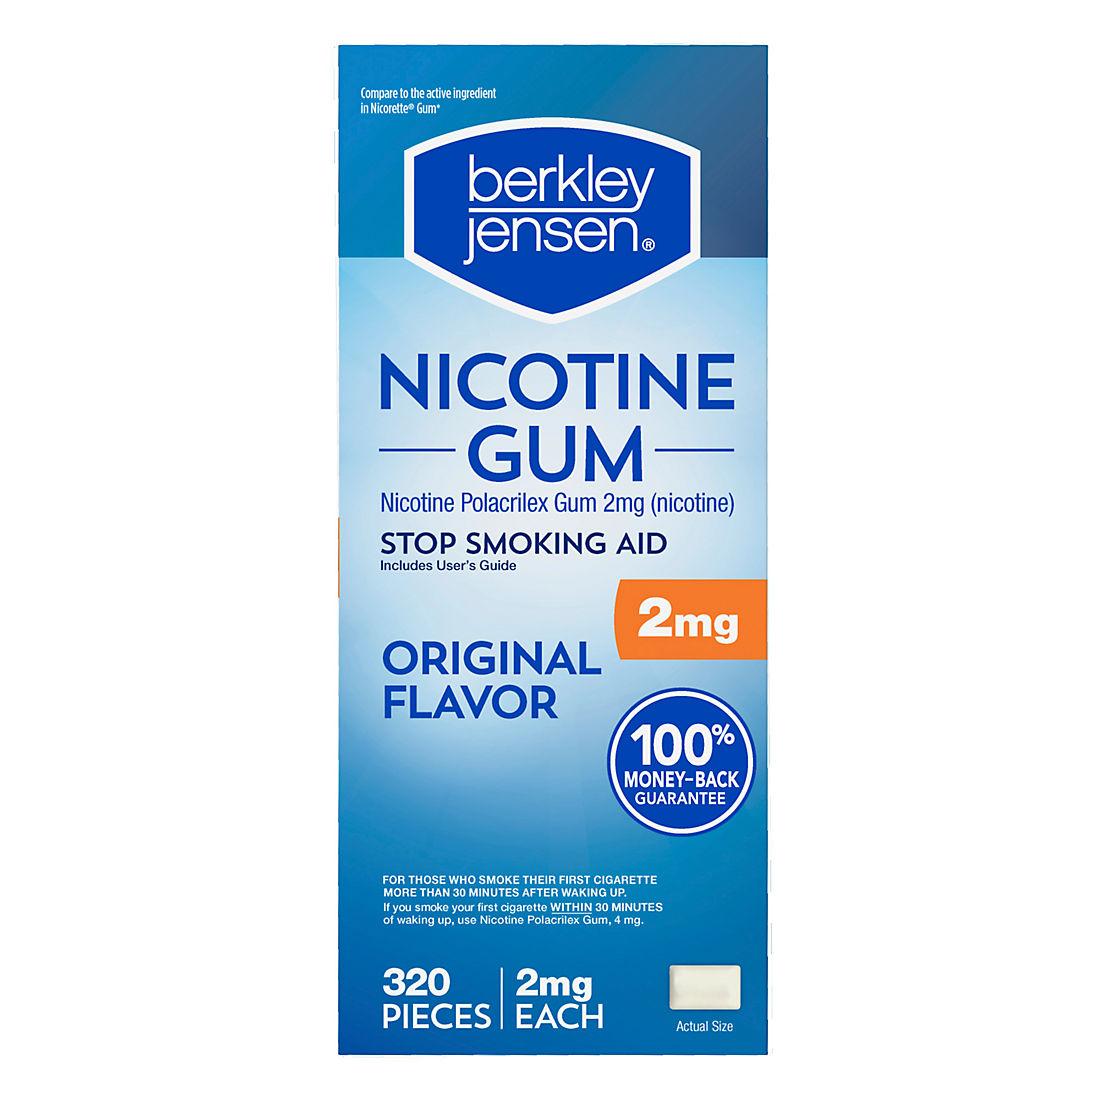 Berkley Jensen 2mg Uncoated Nicotine Gum, 320ct